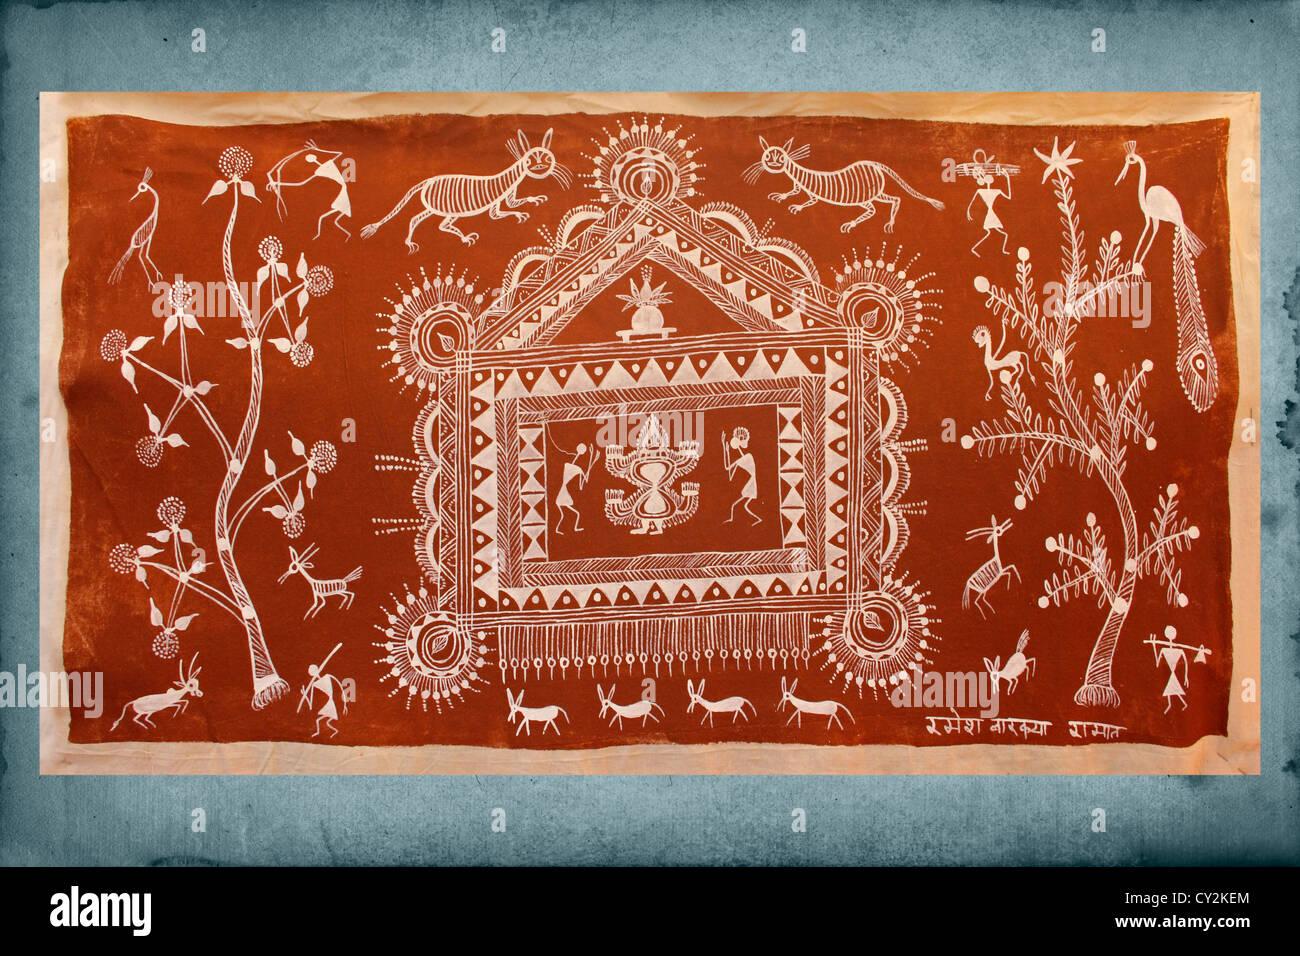 Warli wall painting handicraft maharashtra india stock photo warli wall painting handicraft maharashtra india altavistaventures Image collections